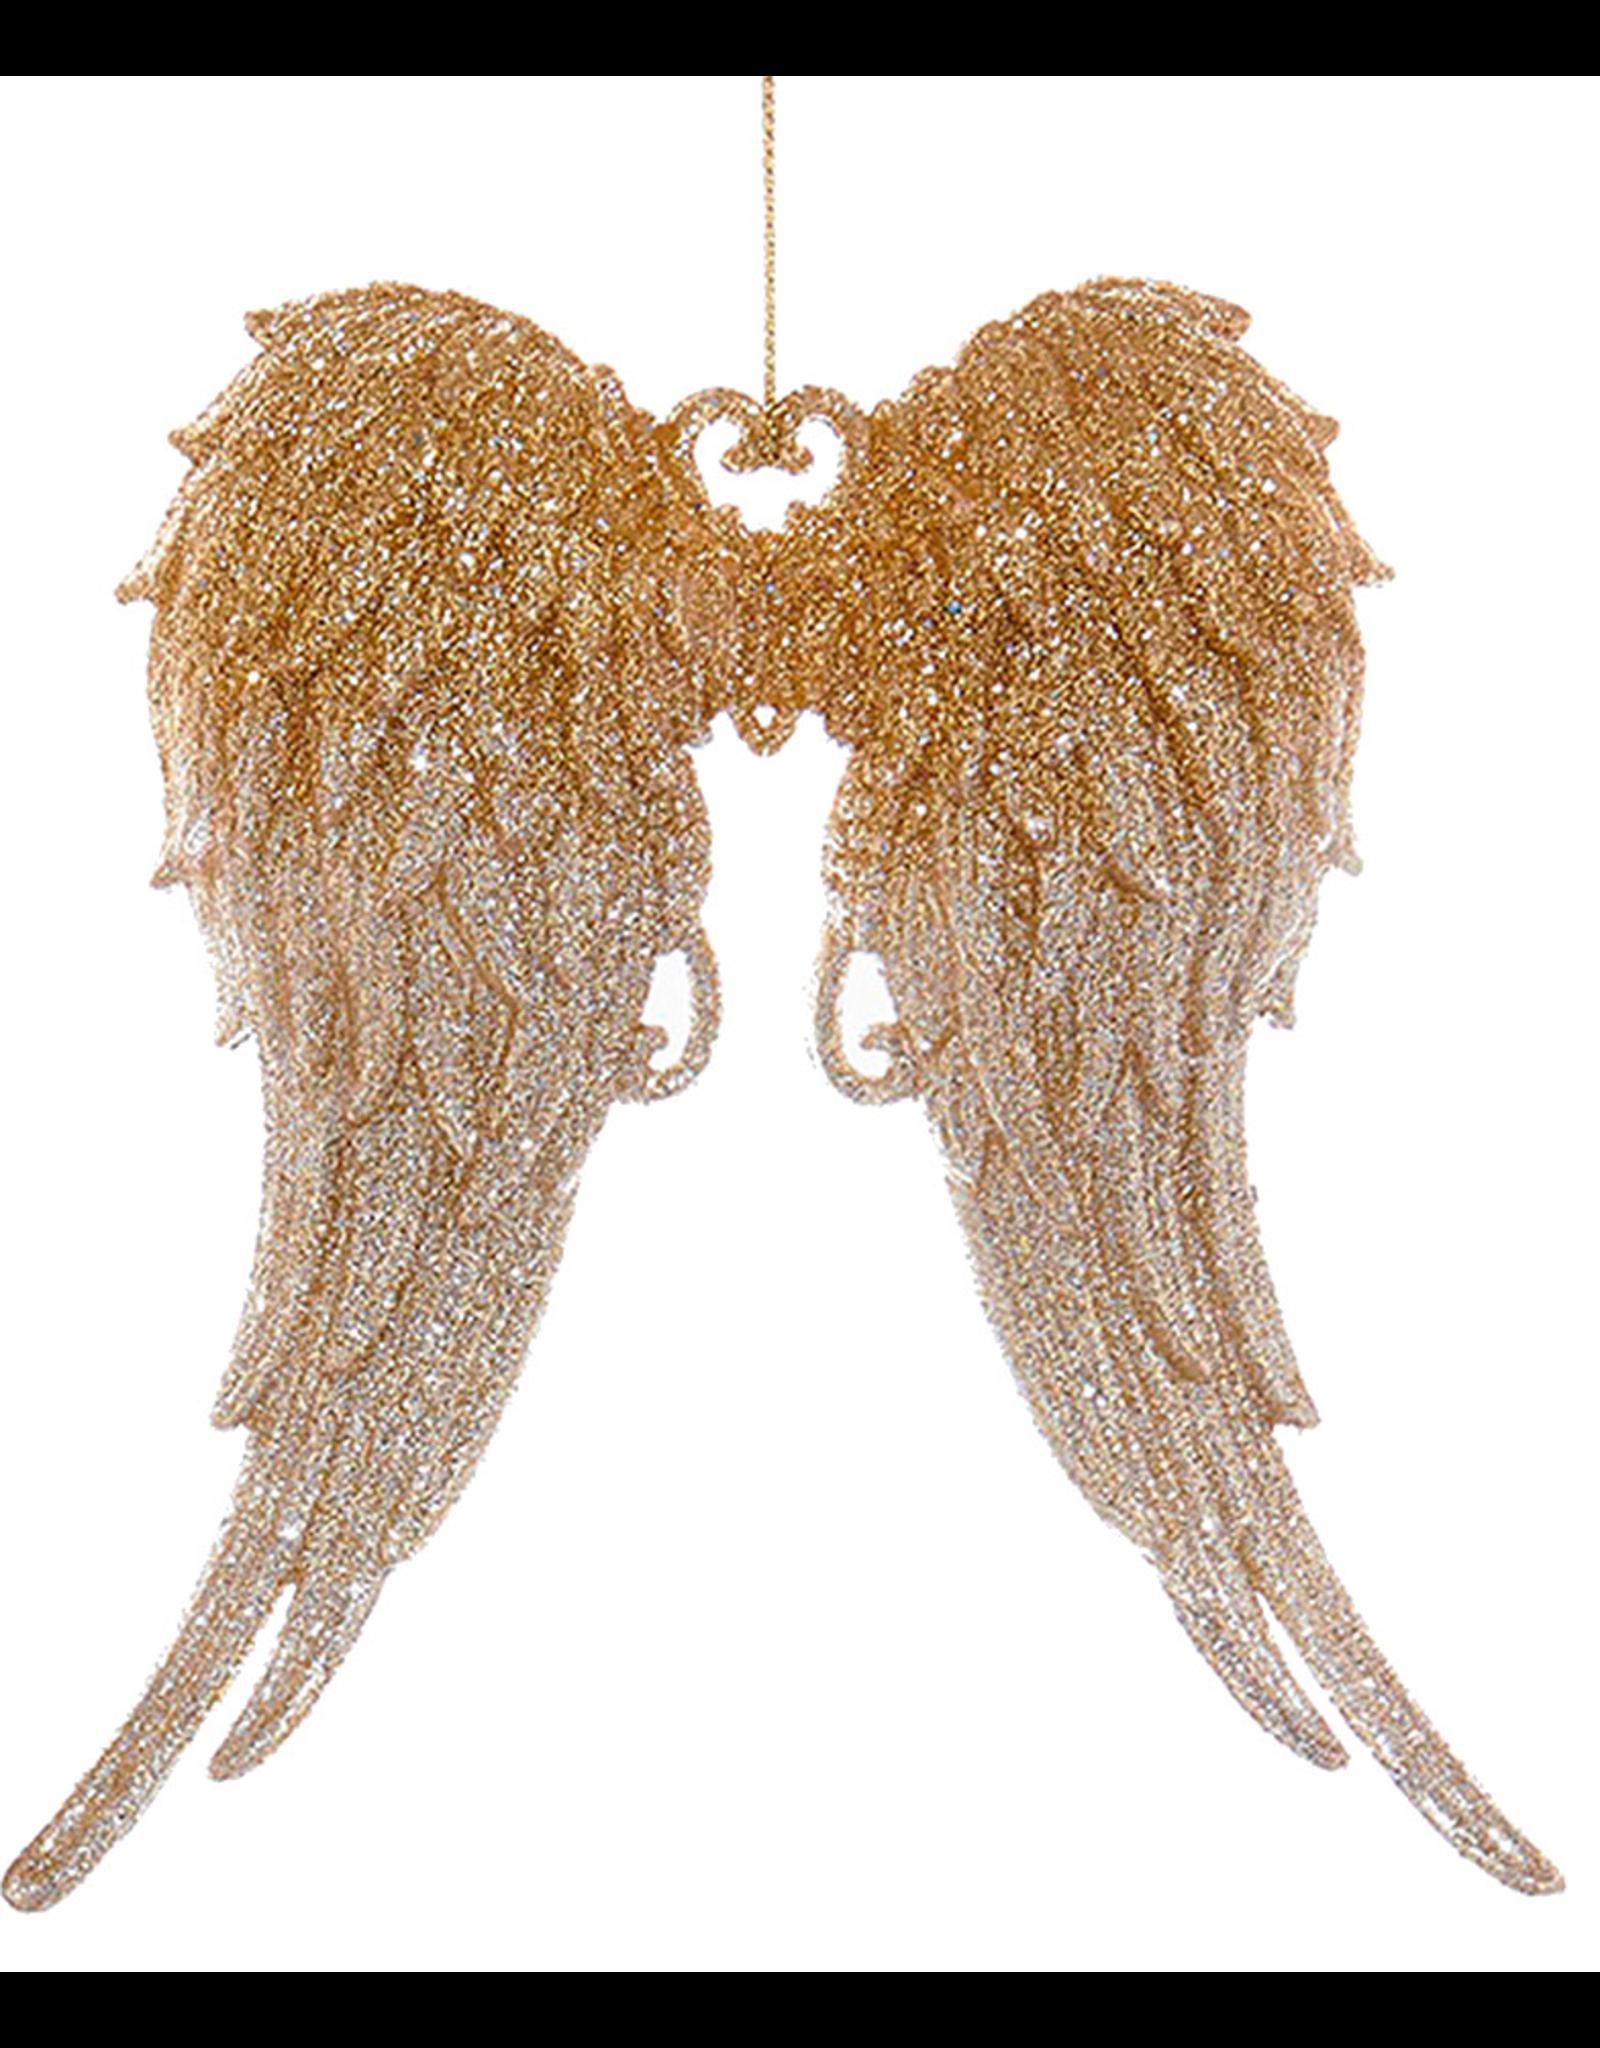 Kurt Adler Angel Wings Ornament w Glittered Gold to Silver Tips